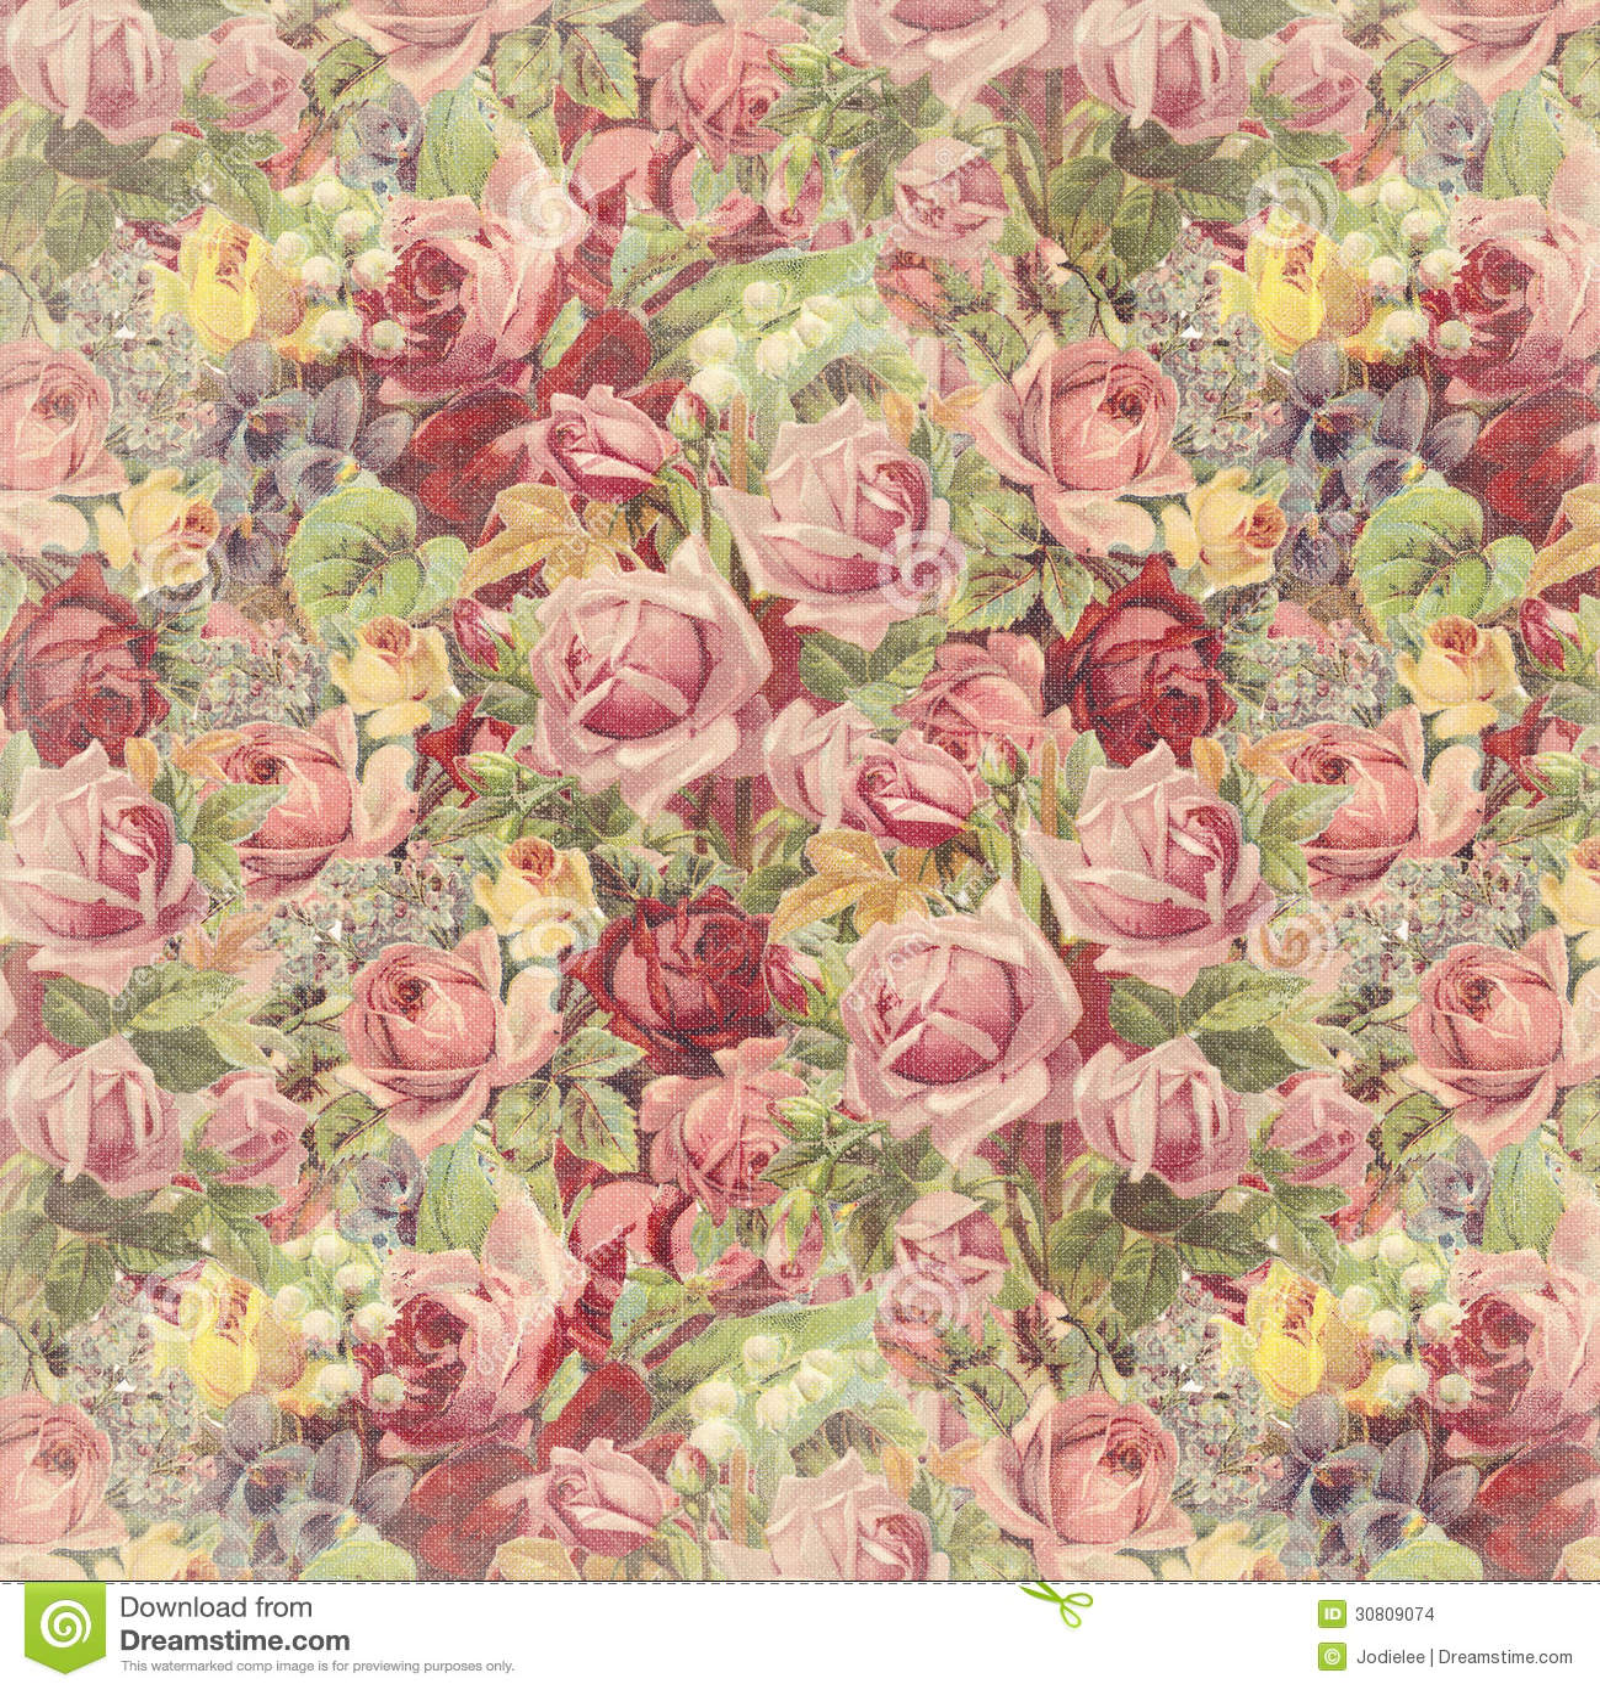 Vintage Rose Background Stock Photo 30809074 Megapixl